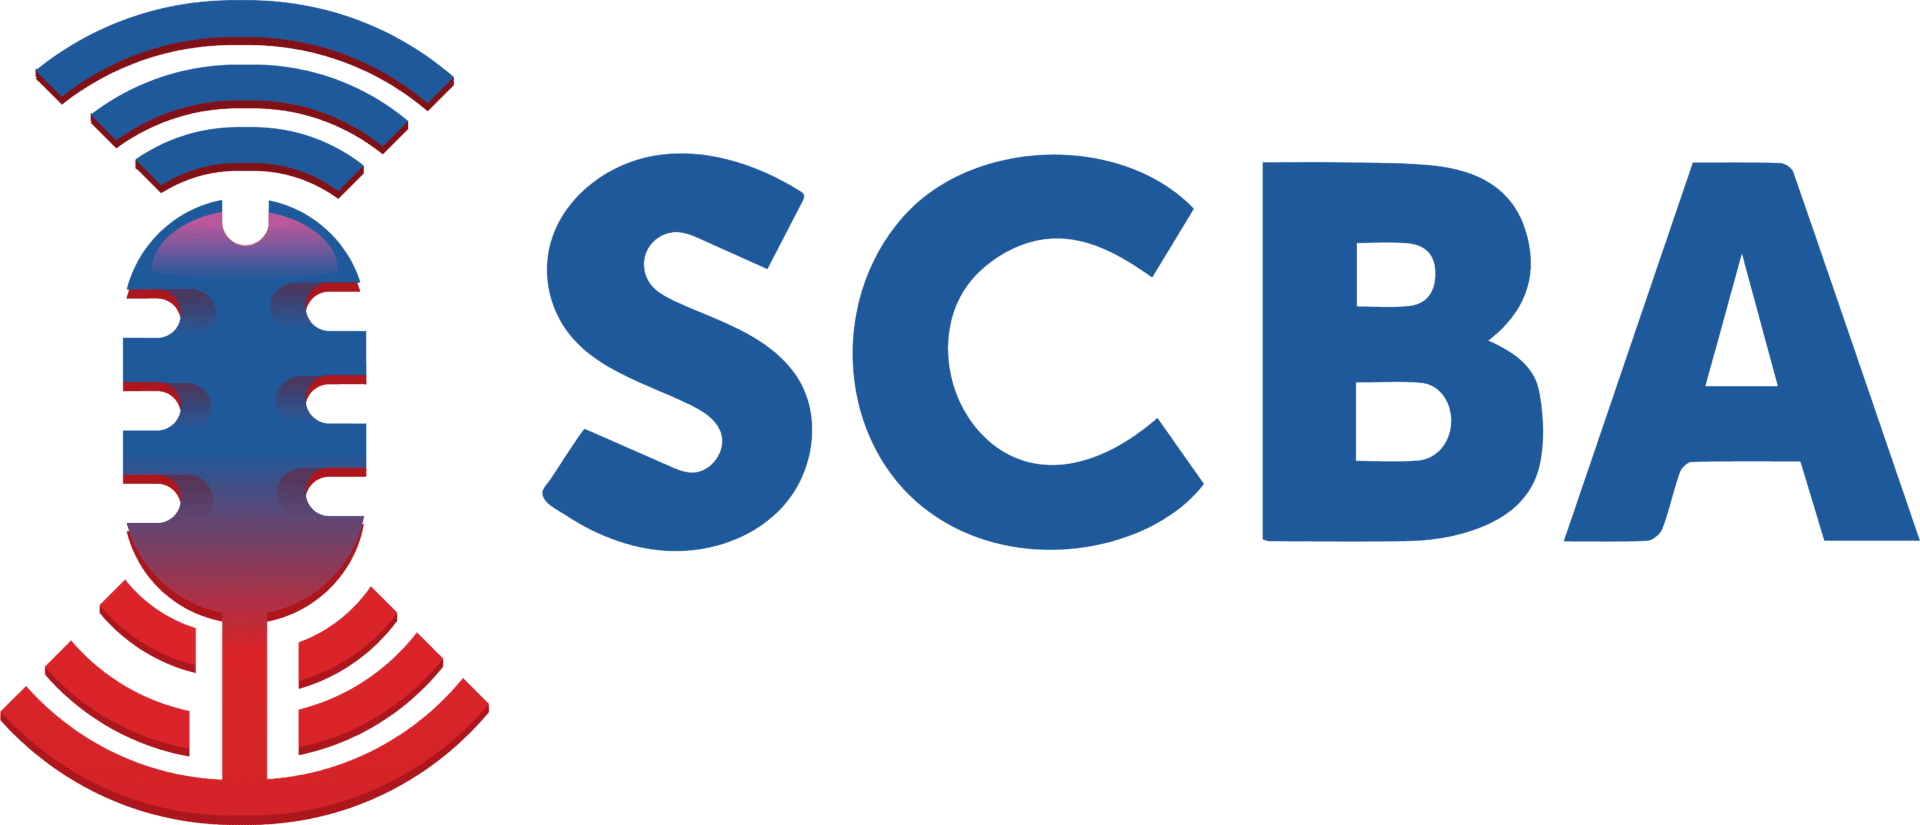 SCBA-logo